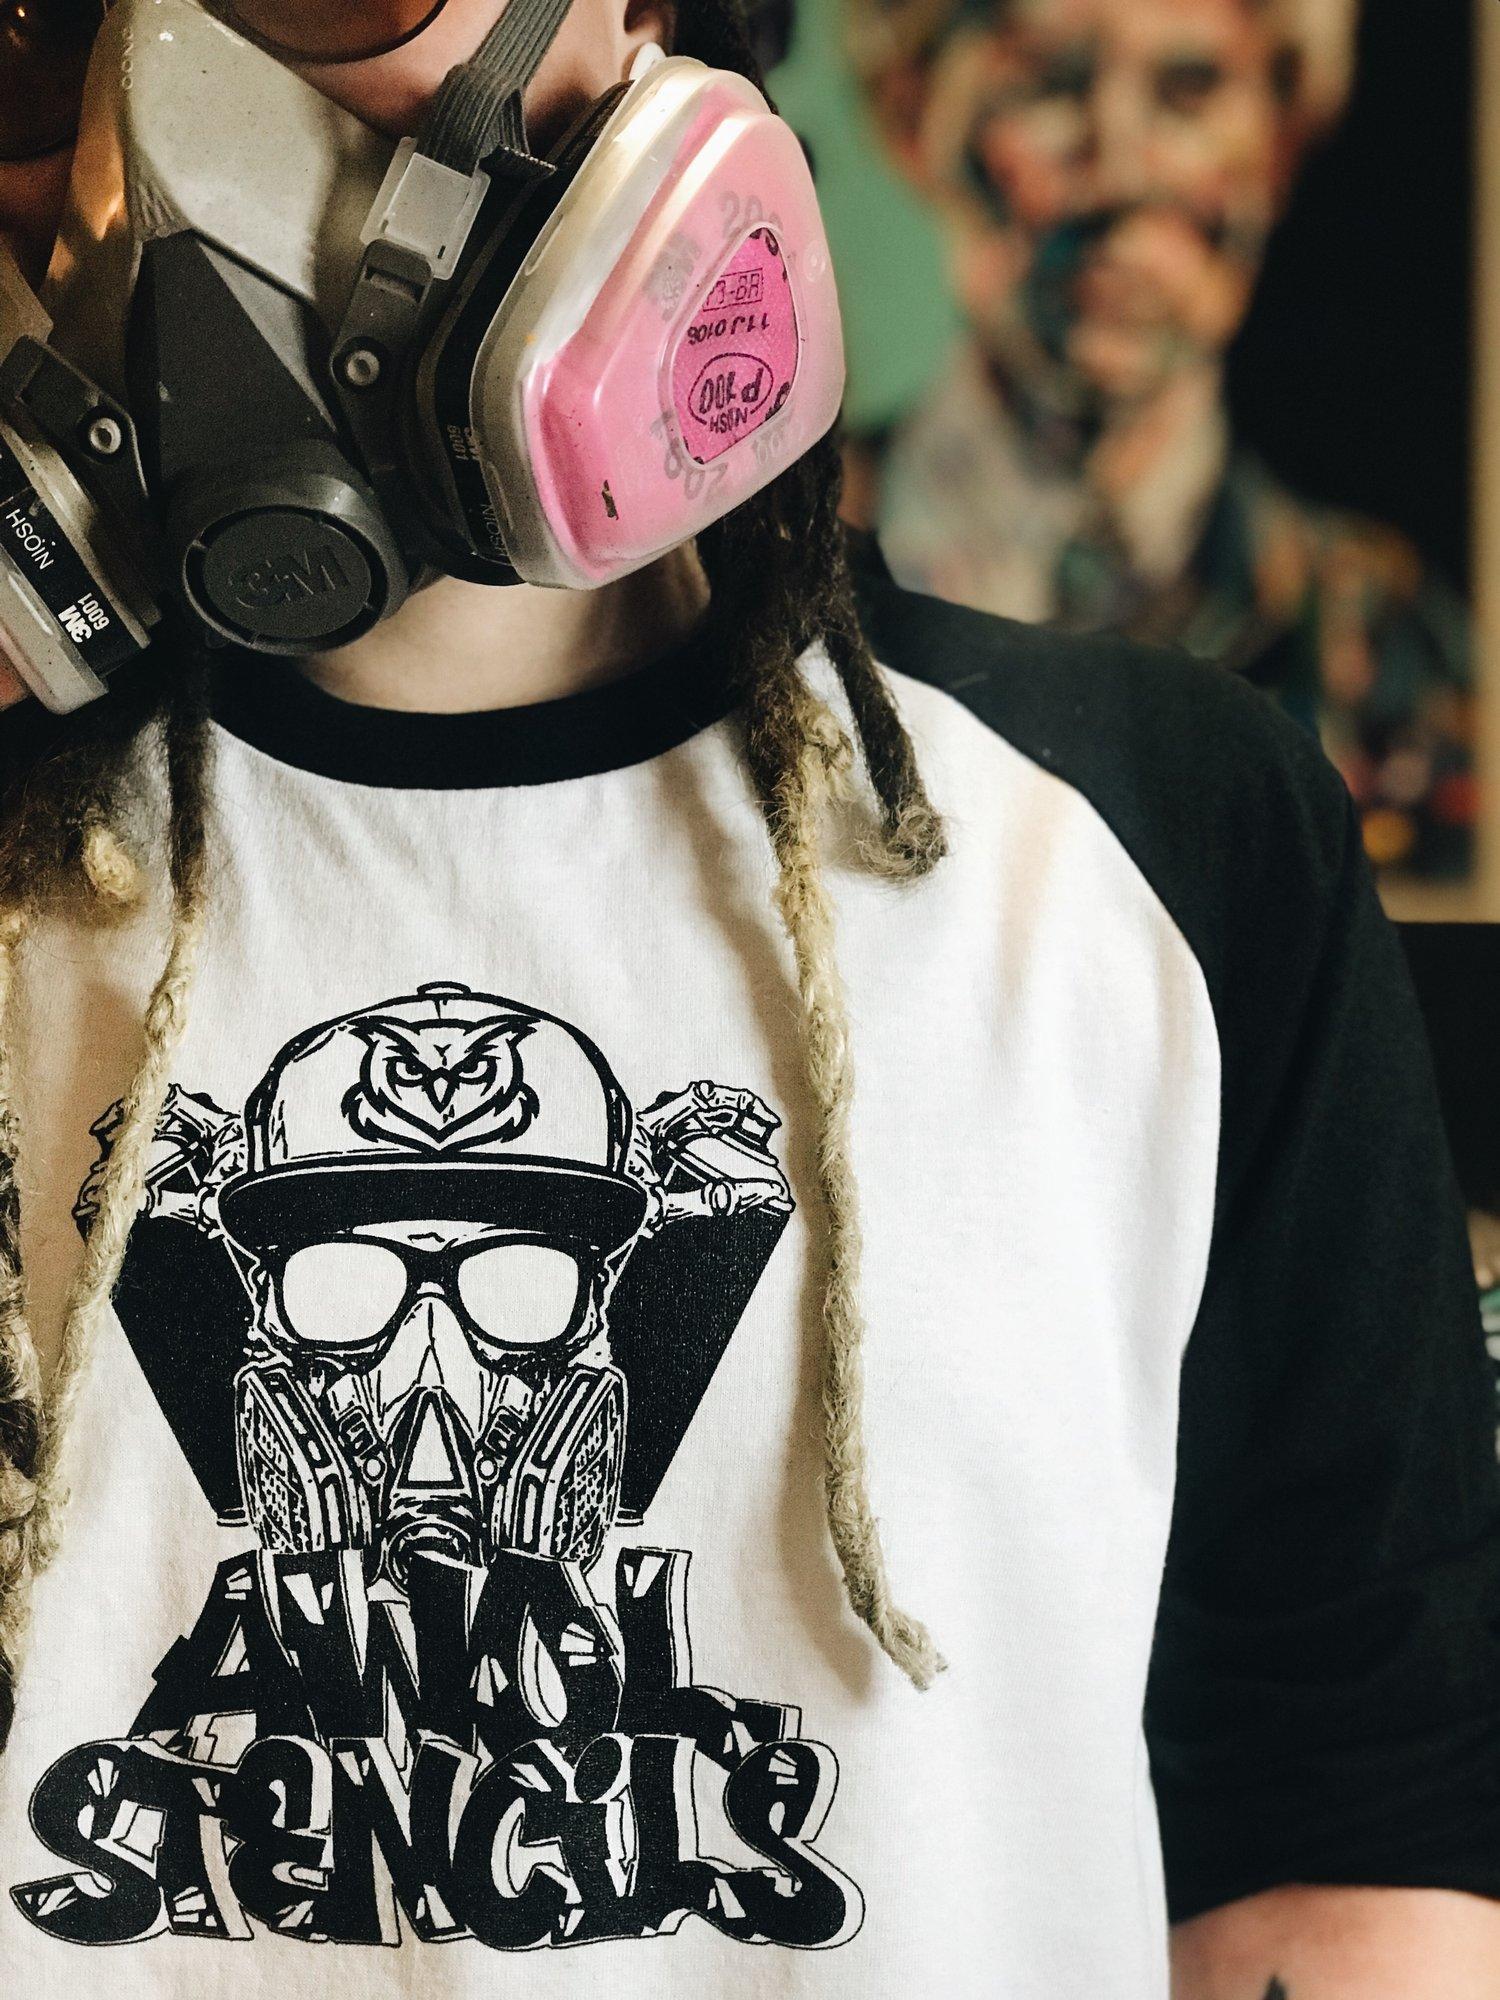 Image of AWOL Stencils Shirt